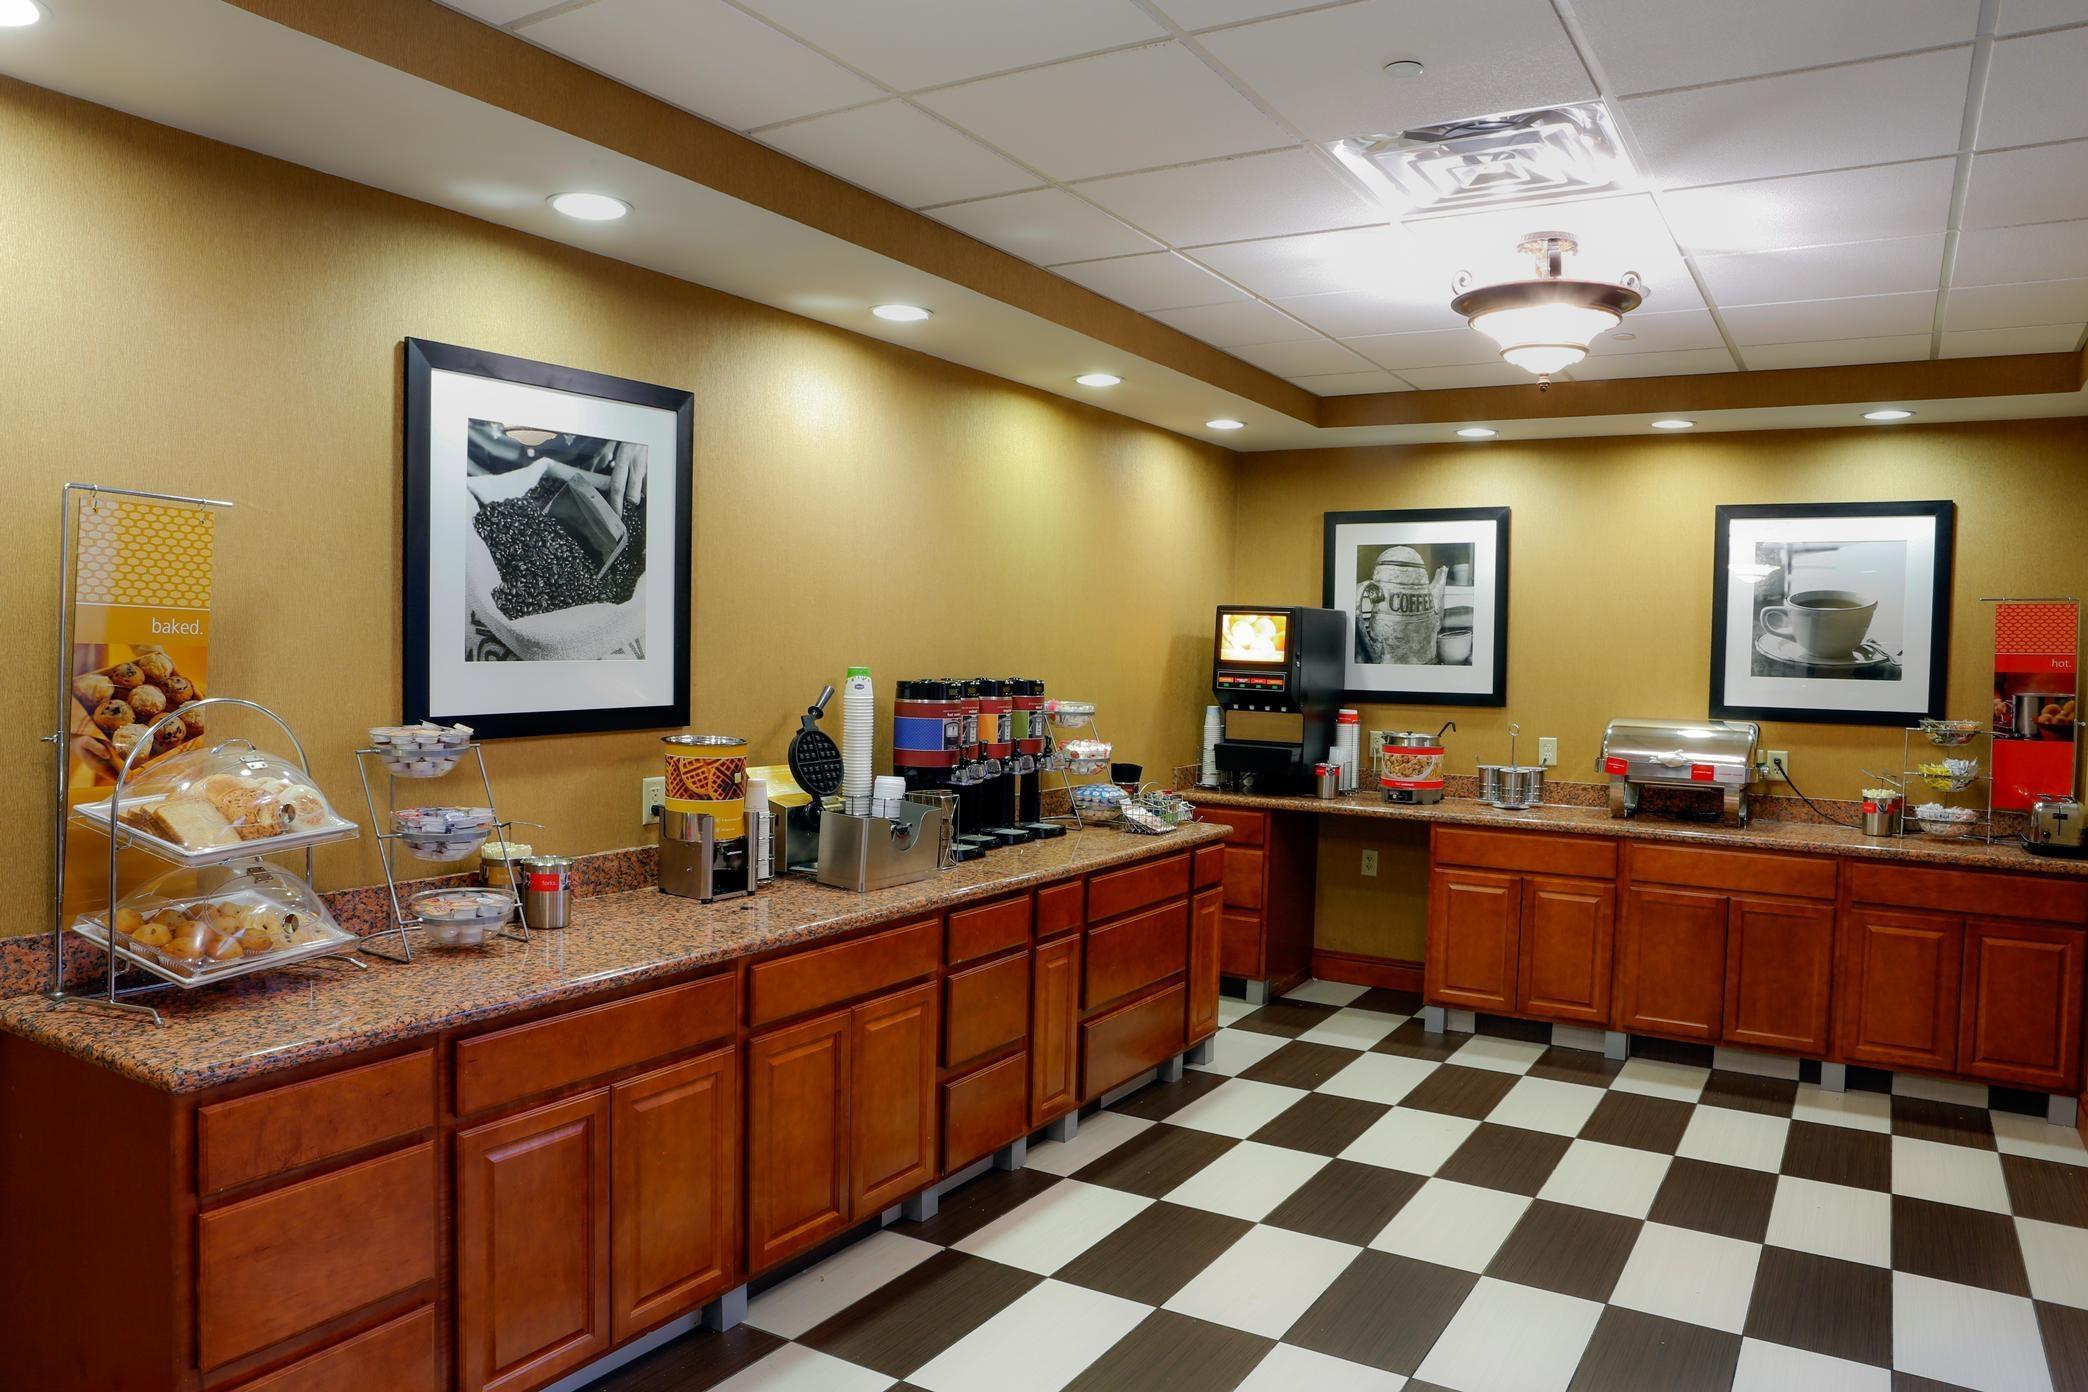 Hampton Inn & Suites Greenfield image 6